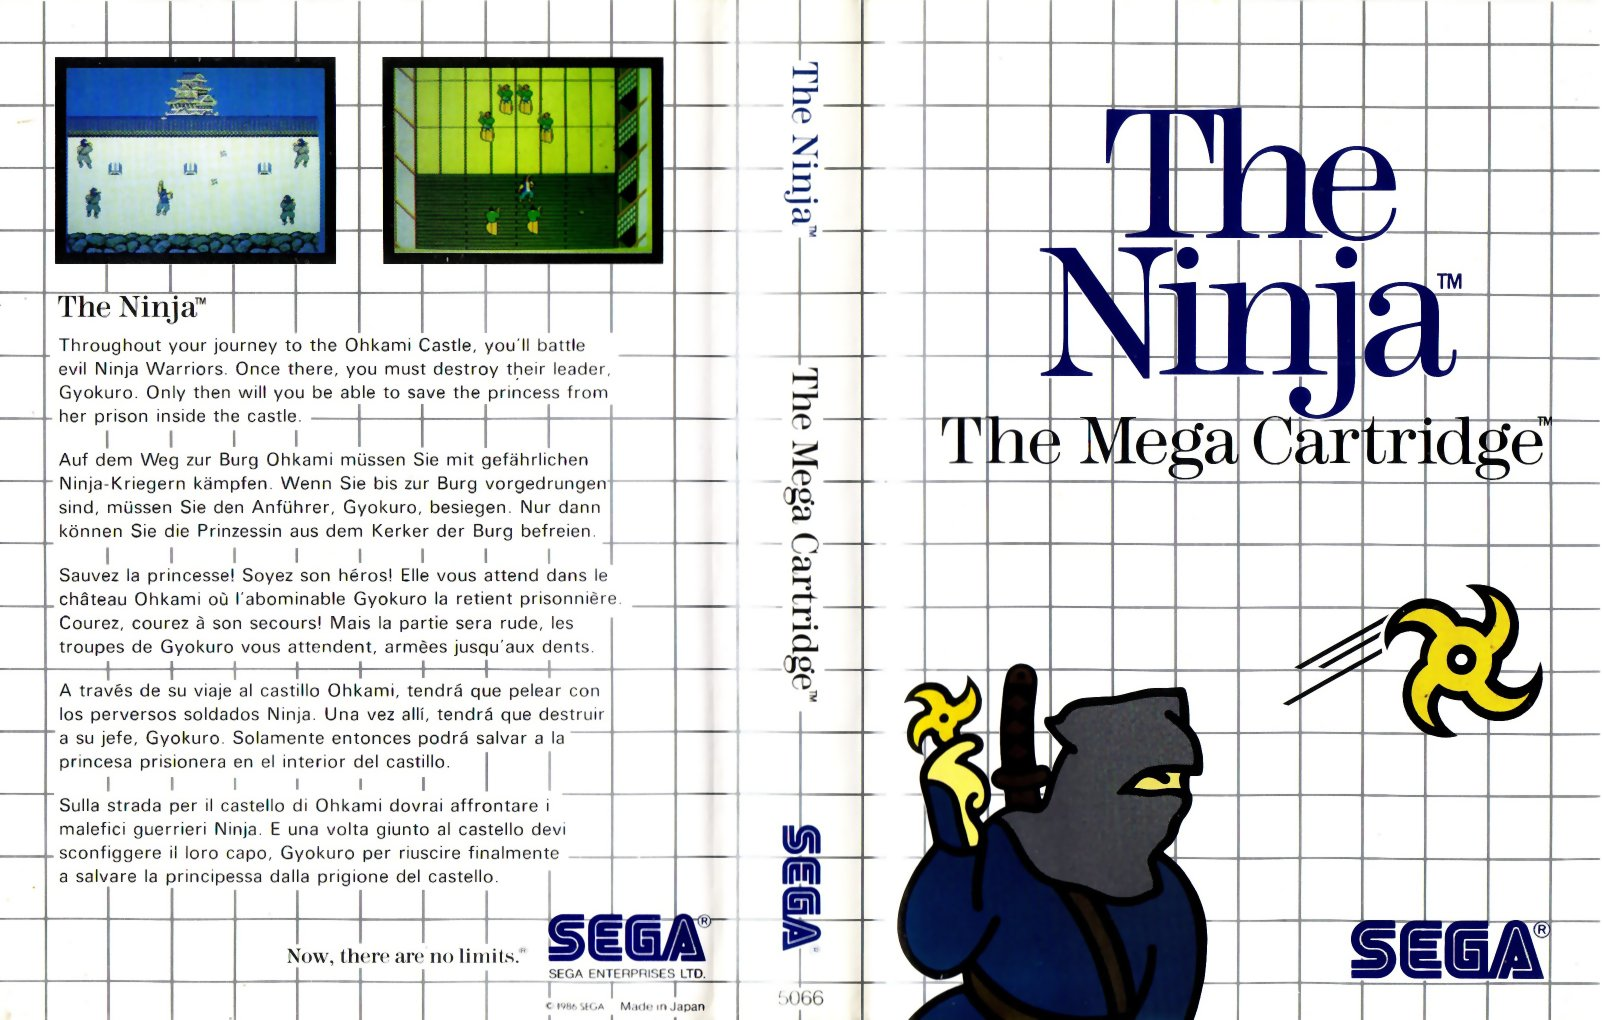 http://www.smspower.org/uploads/Scans/Ninja-SMS-EU-NoLimits-R.jpg